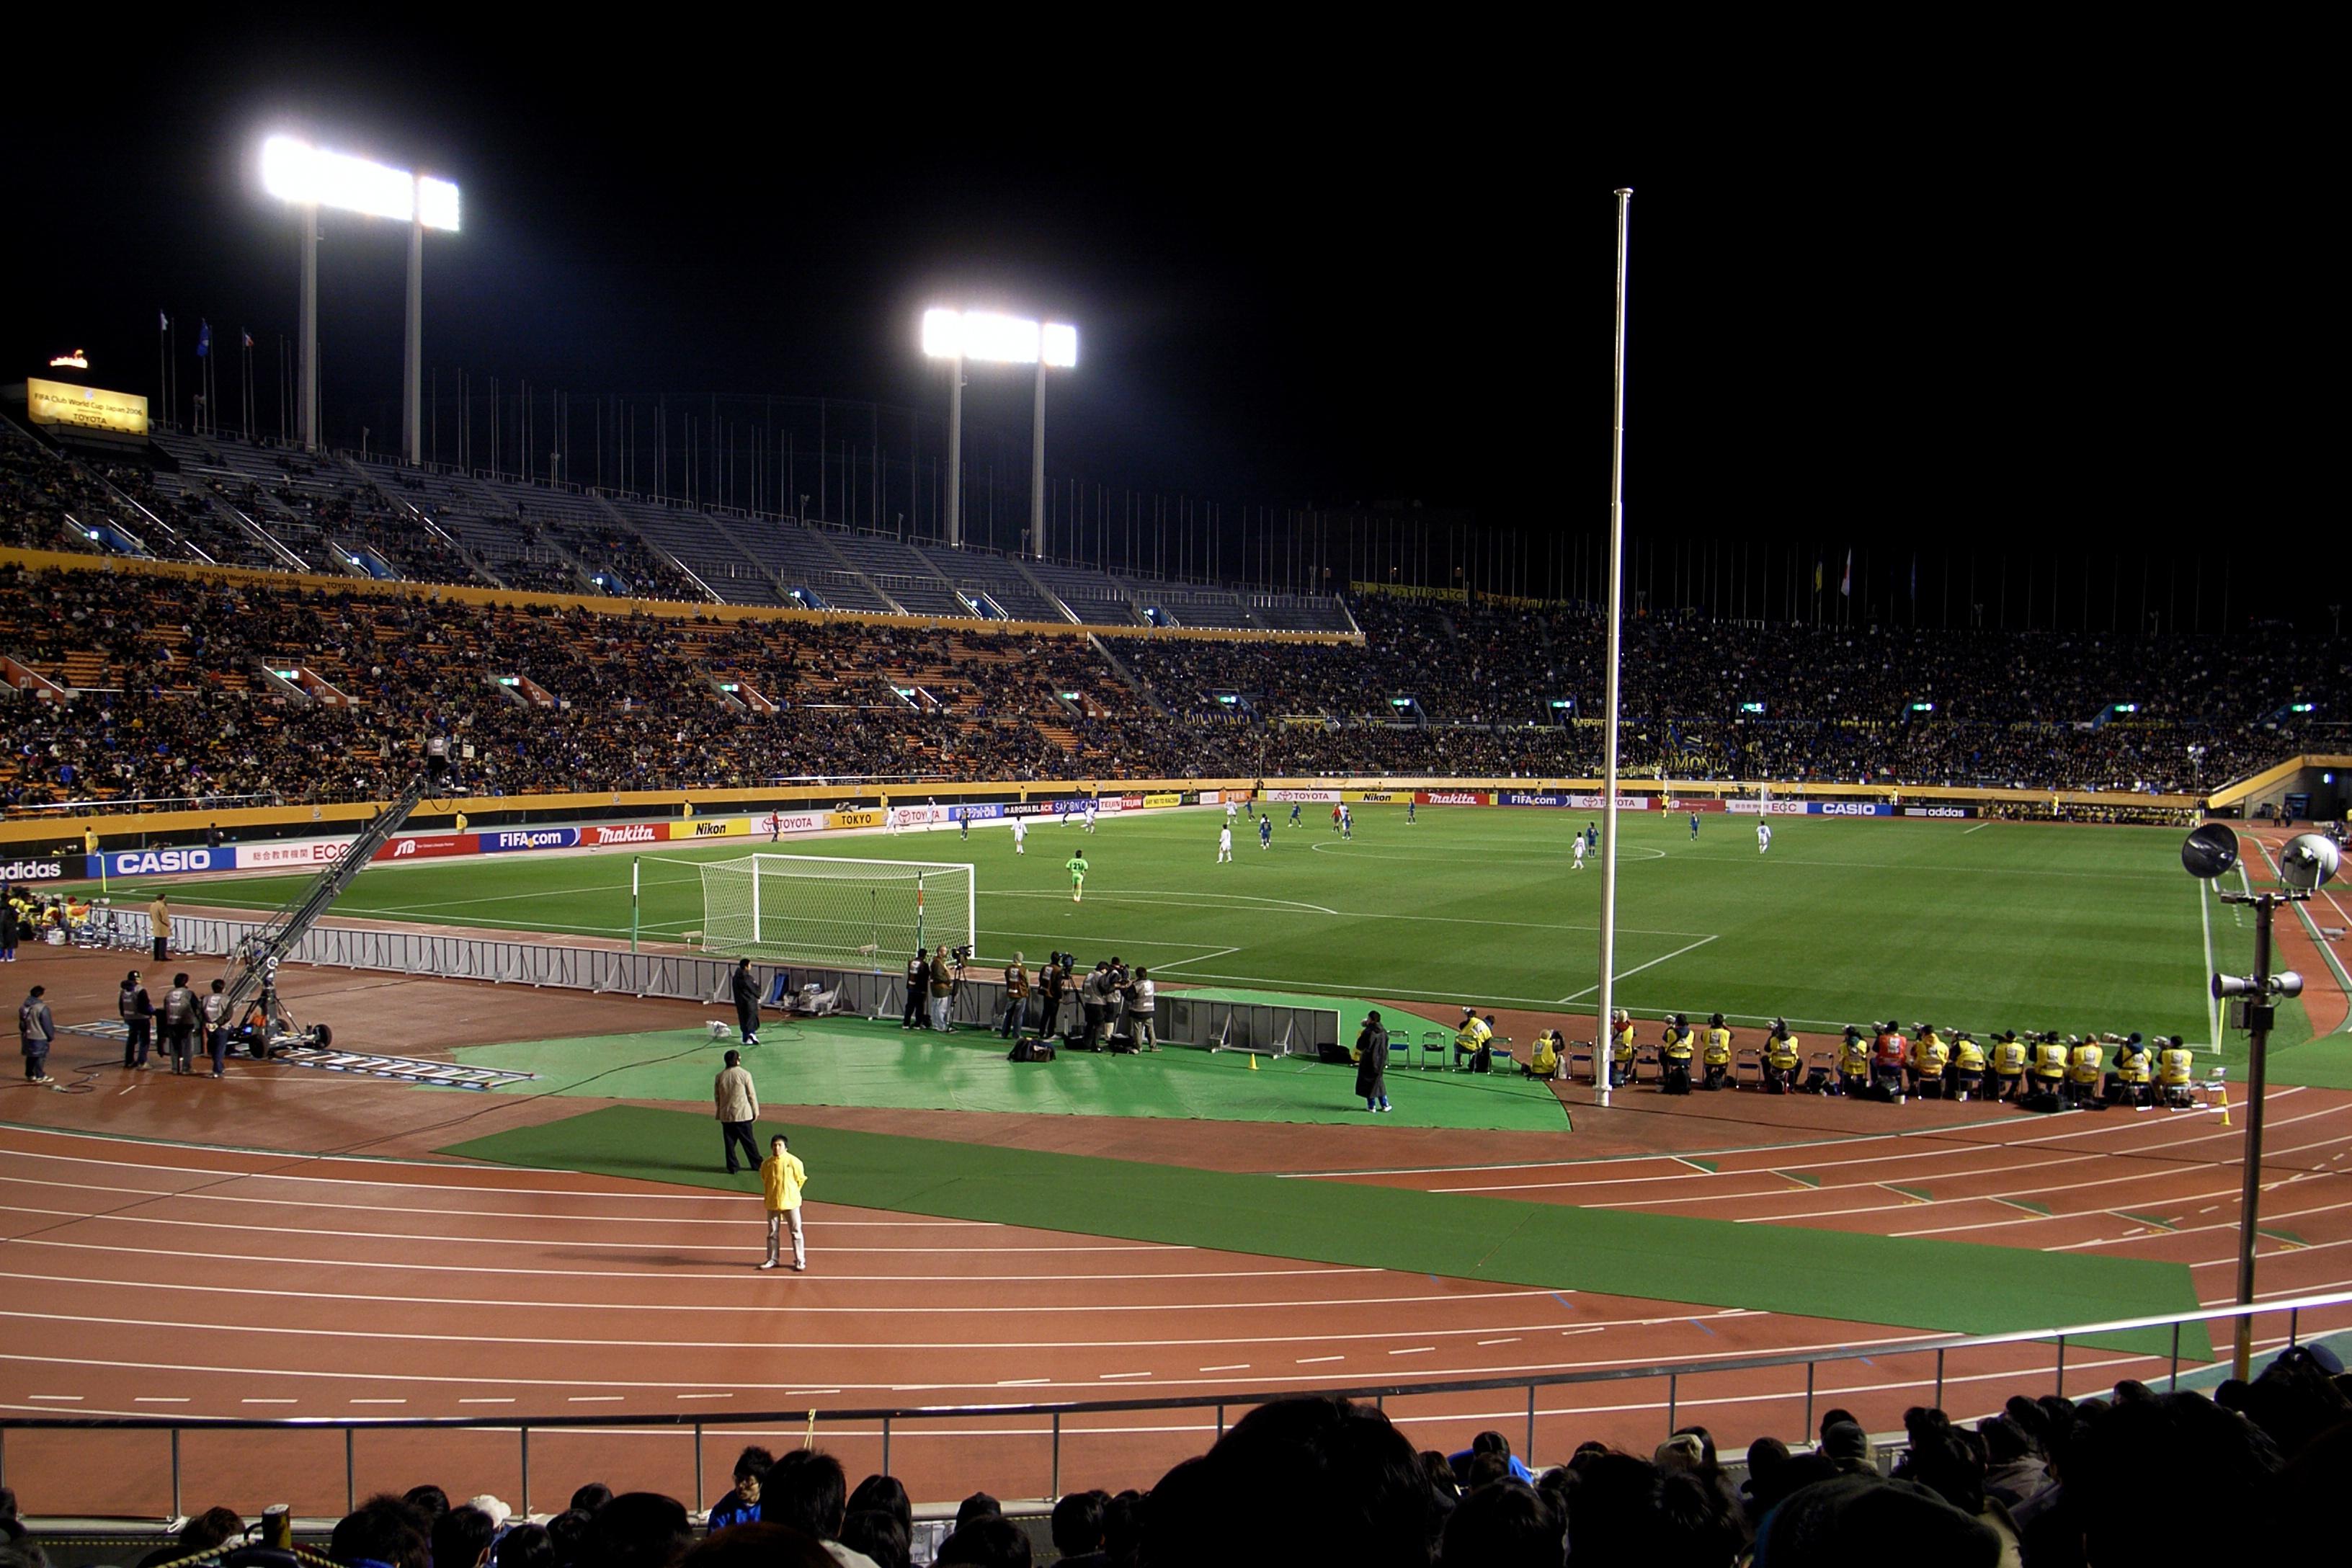 f0c760c3476 File Chonbuk clubamerica.jpg - Wikimedia Commons